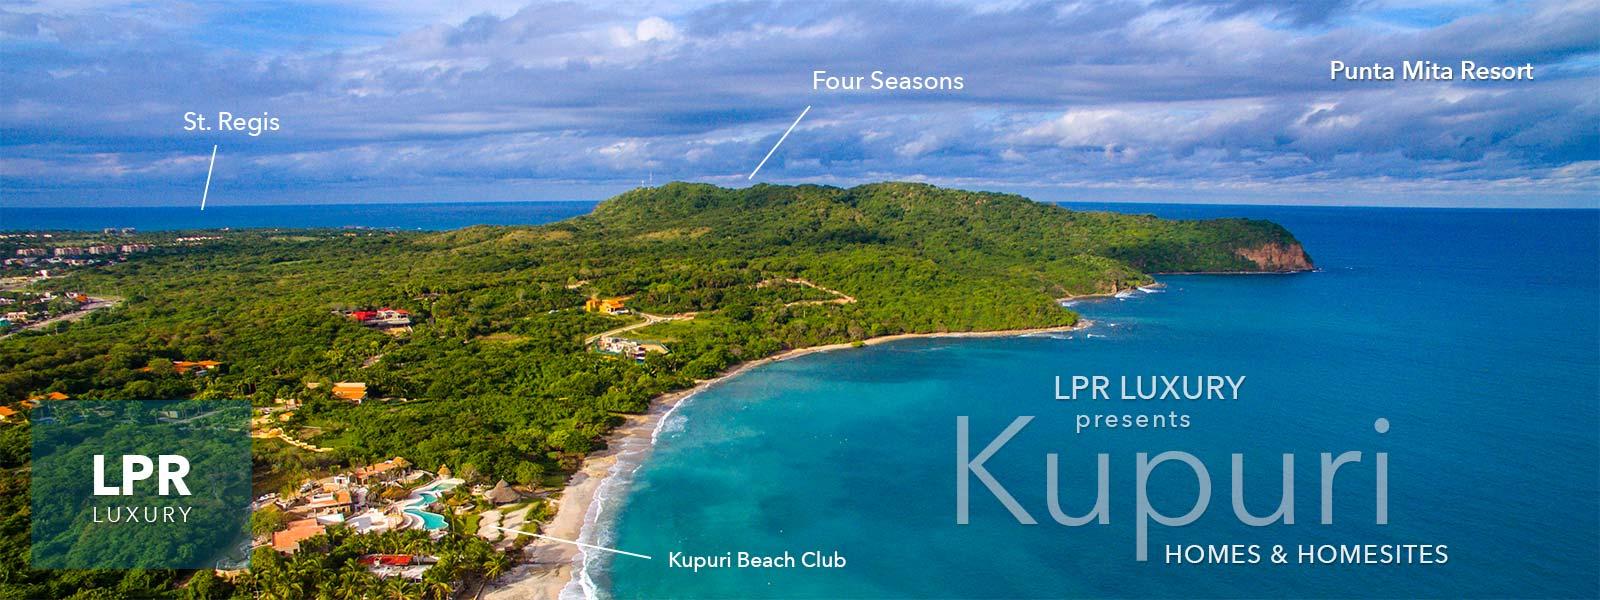 Kupuri - Punta Mita Real Estate : Luxury Resort Homes and Homesites